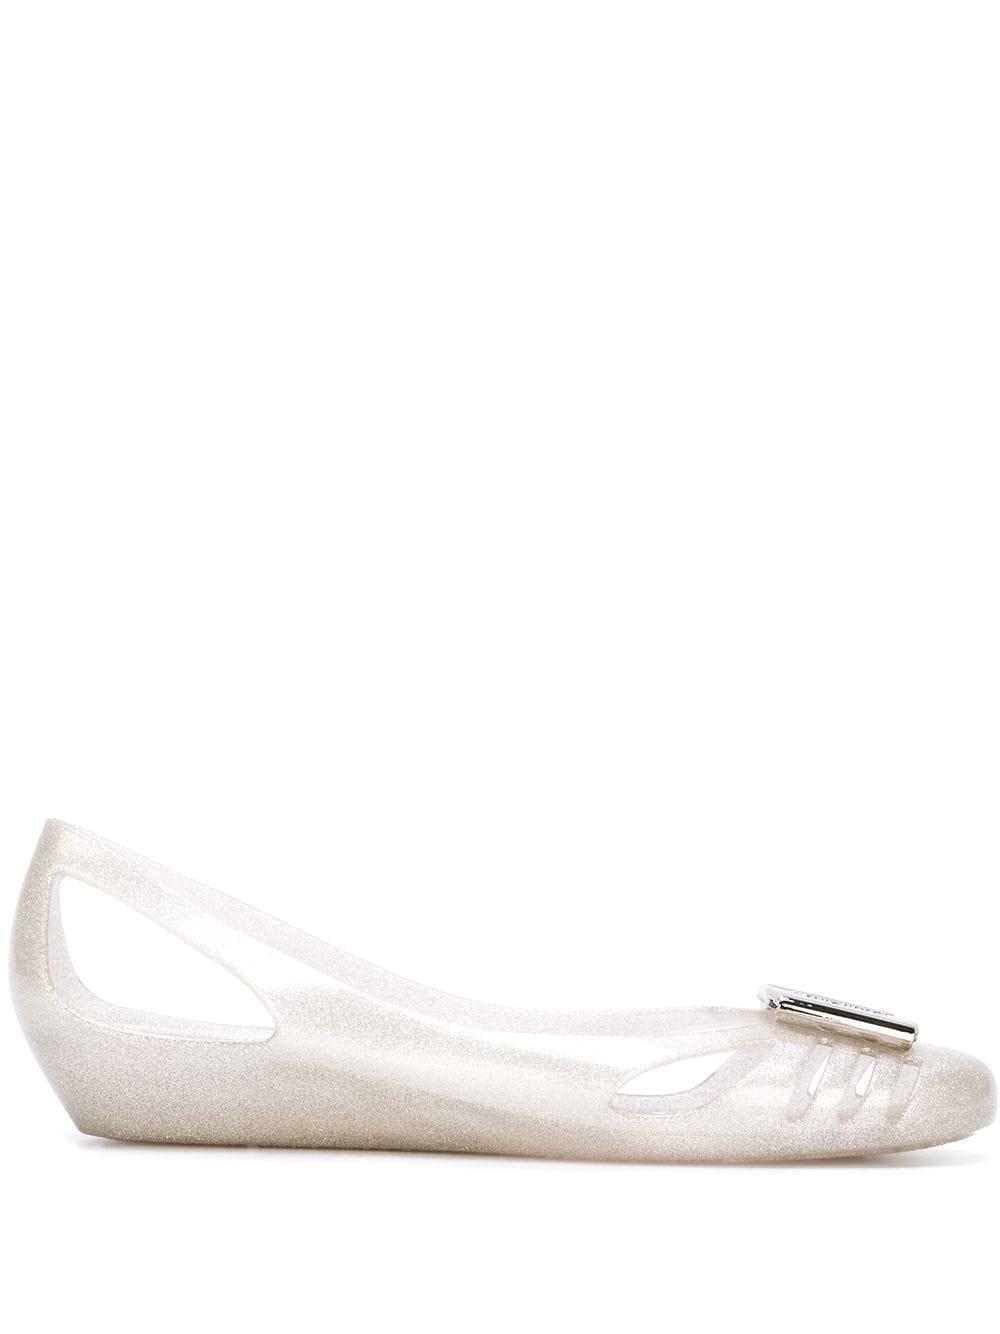 Bermuda Ballets